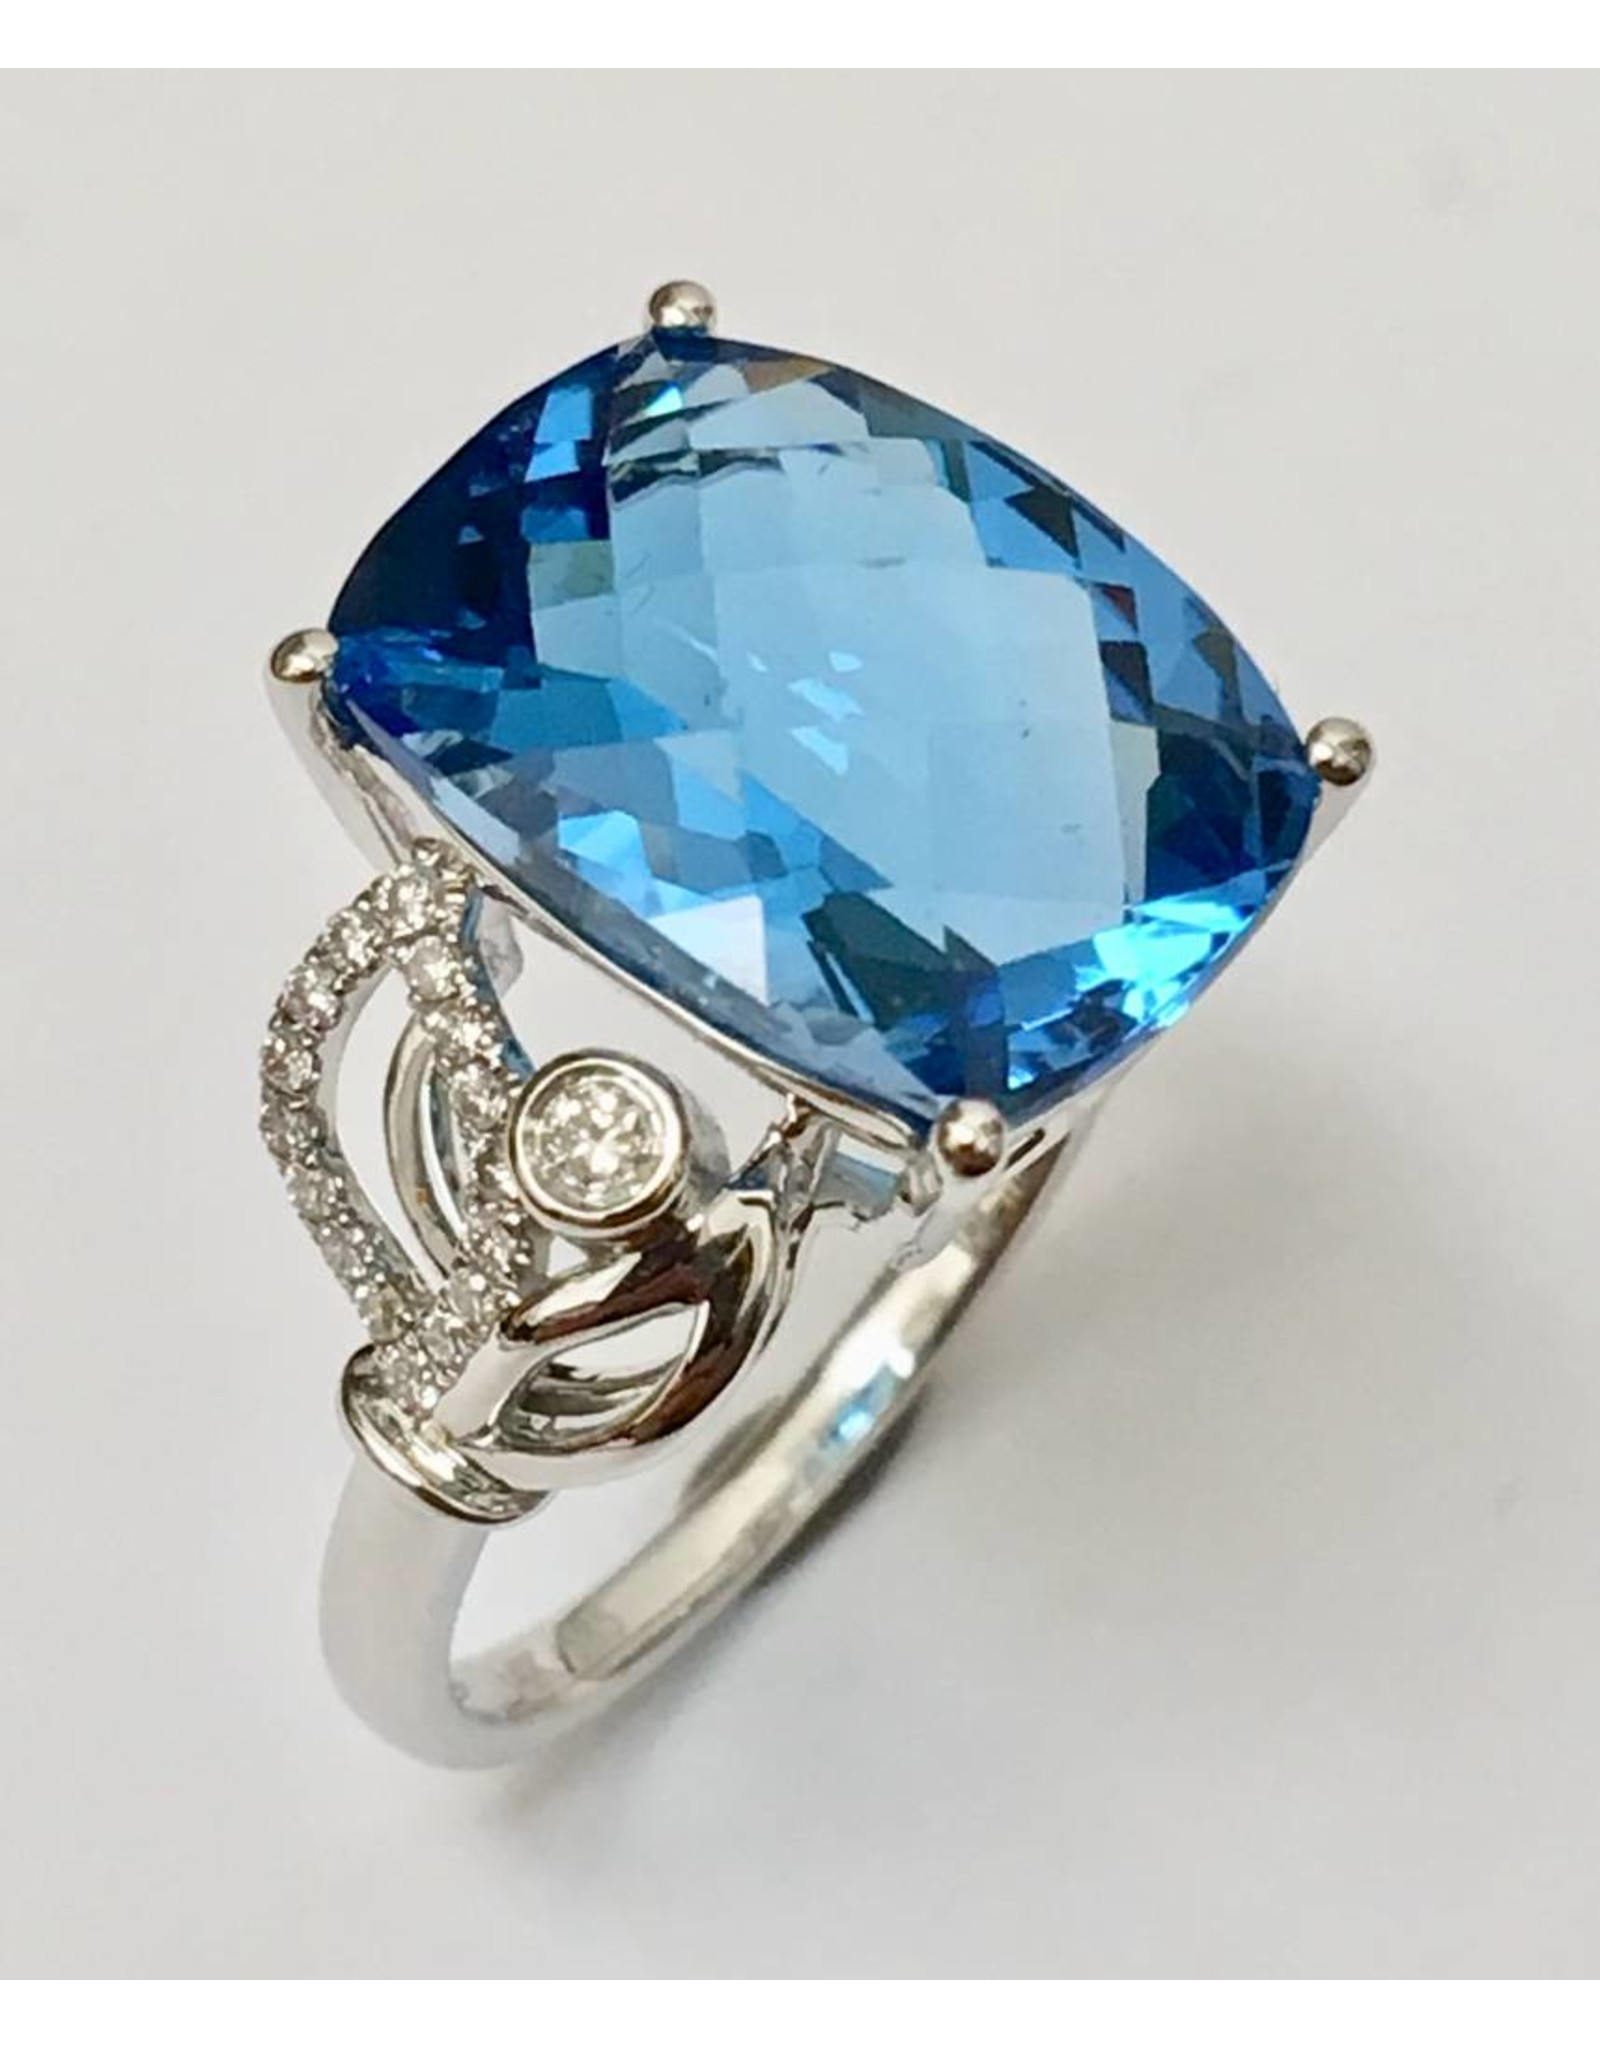 7.14ct Topaz & Diamond Ring 14KW